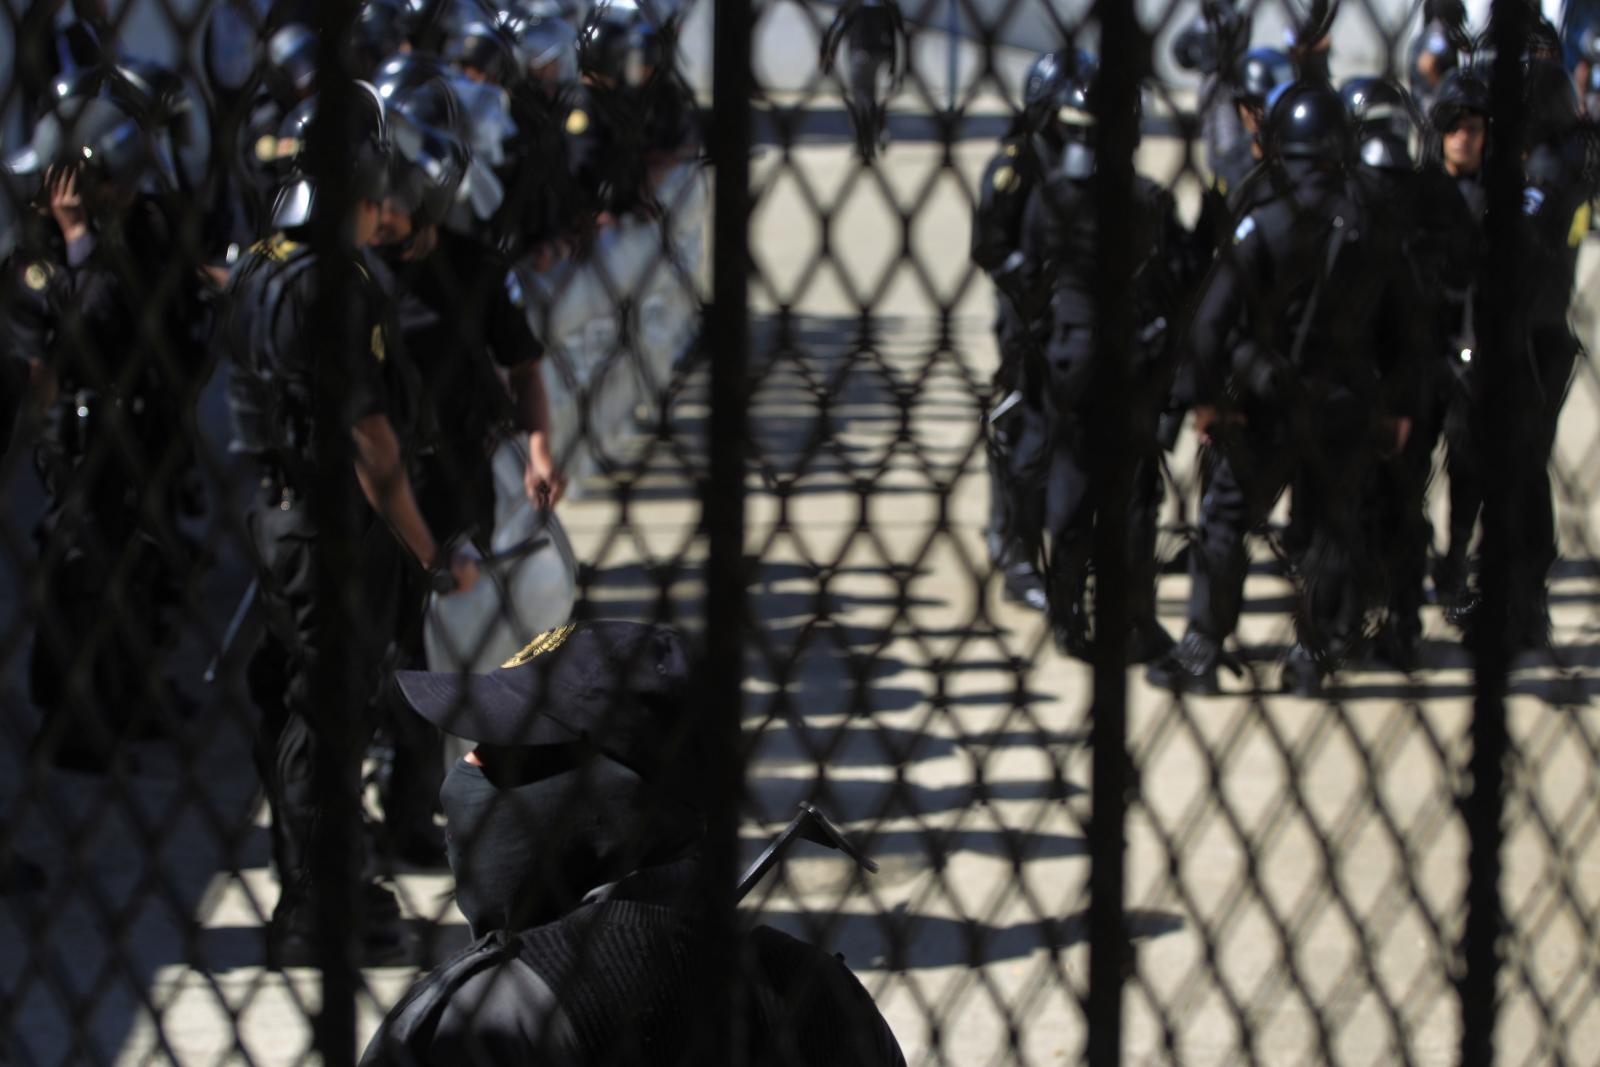 Guatemala prison